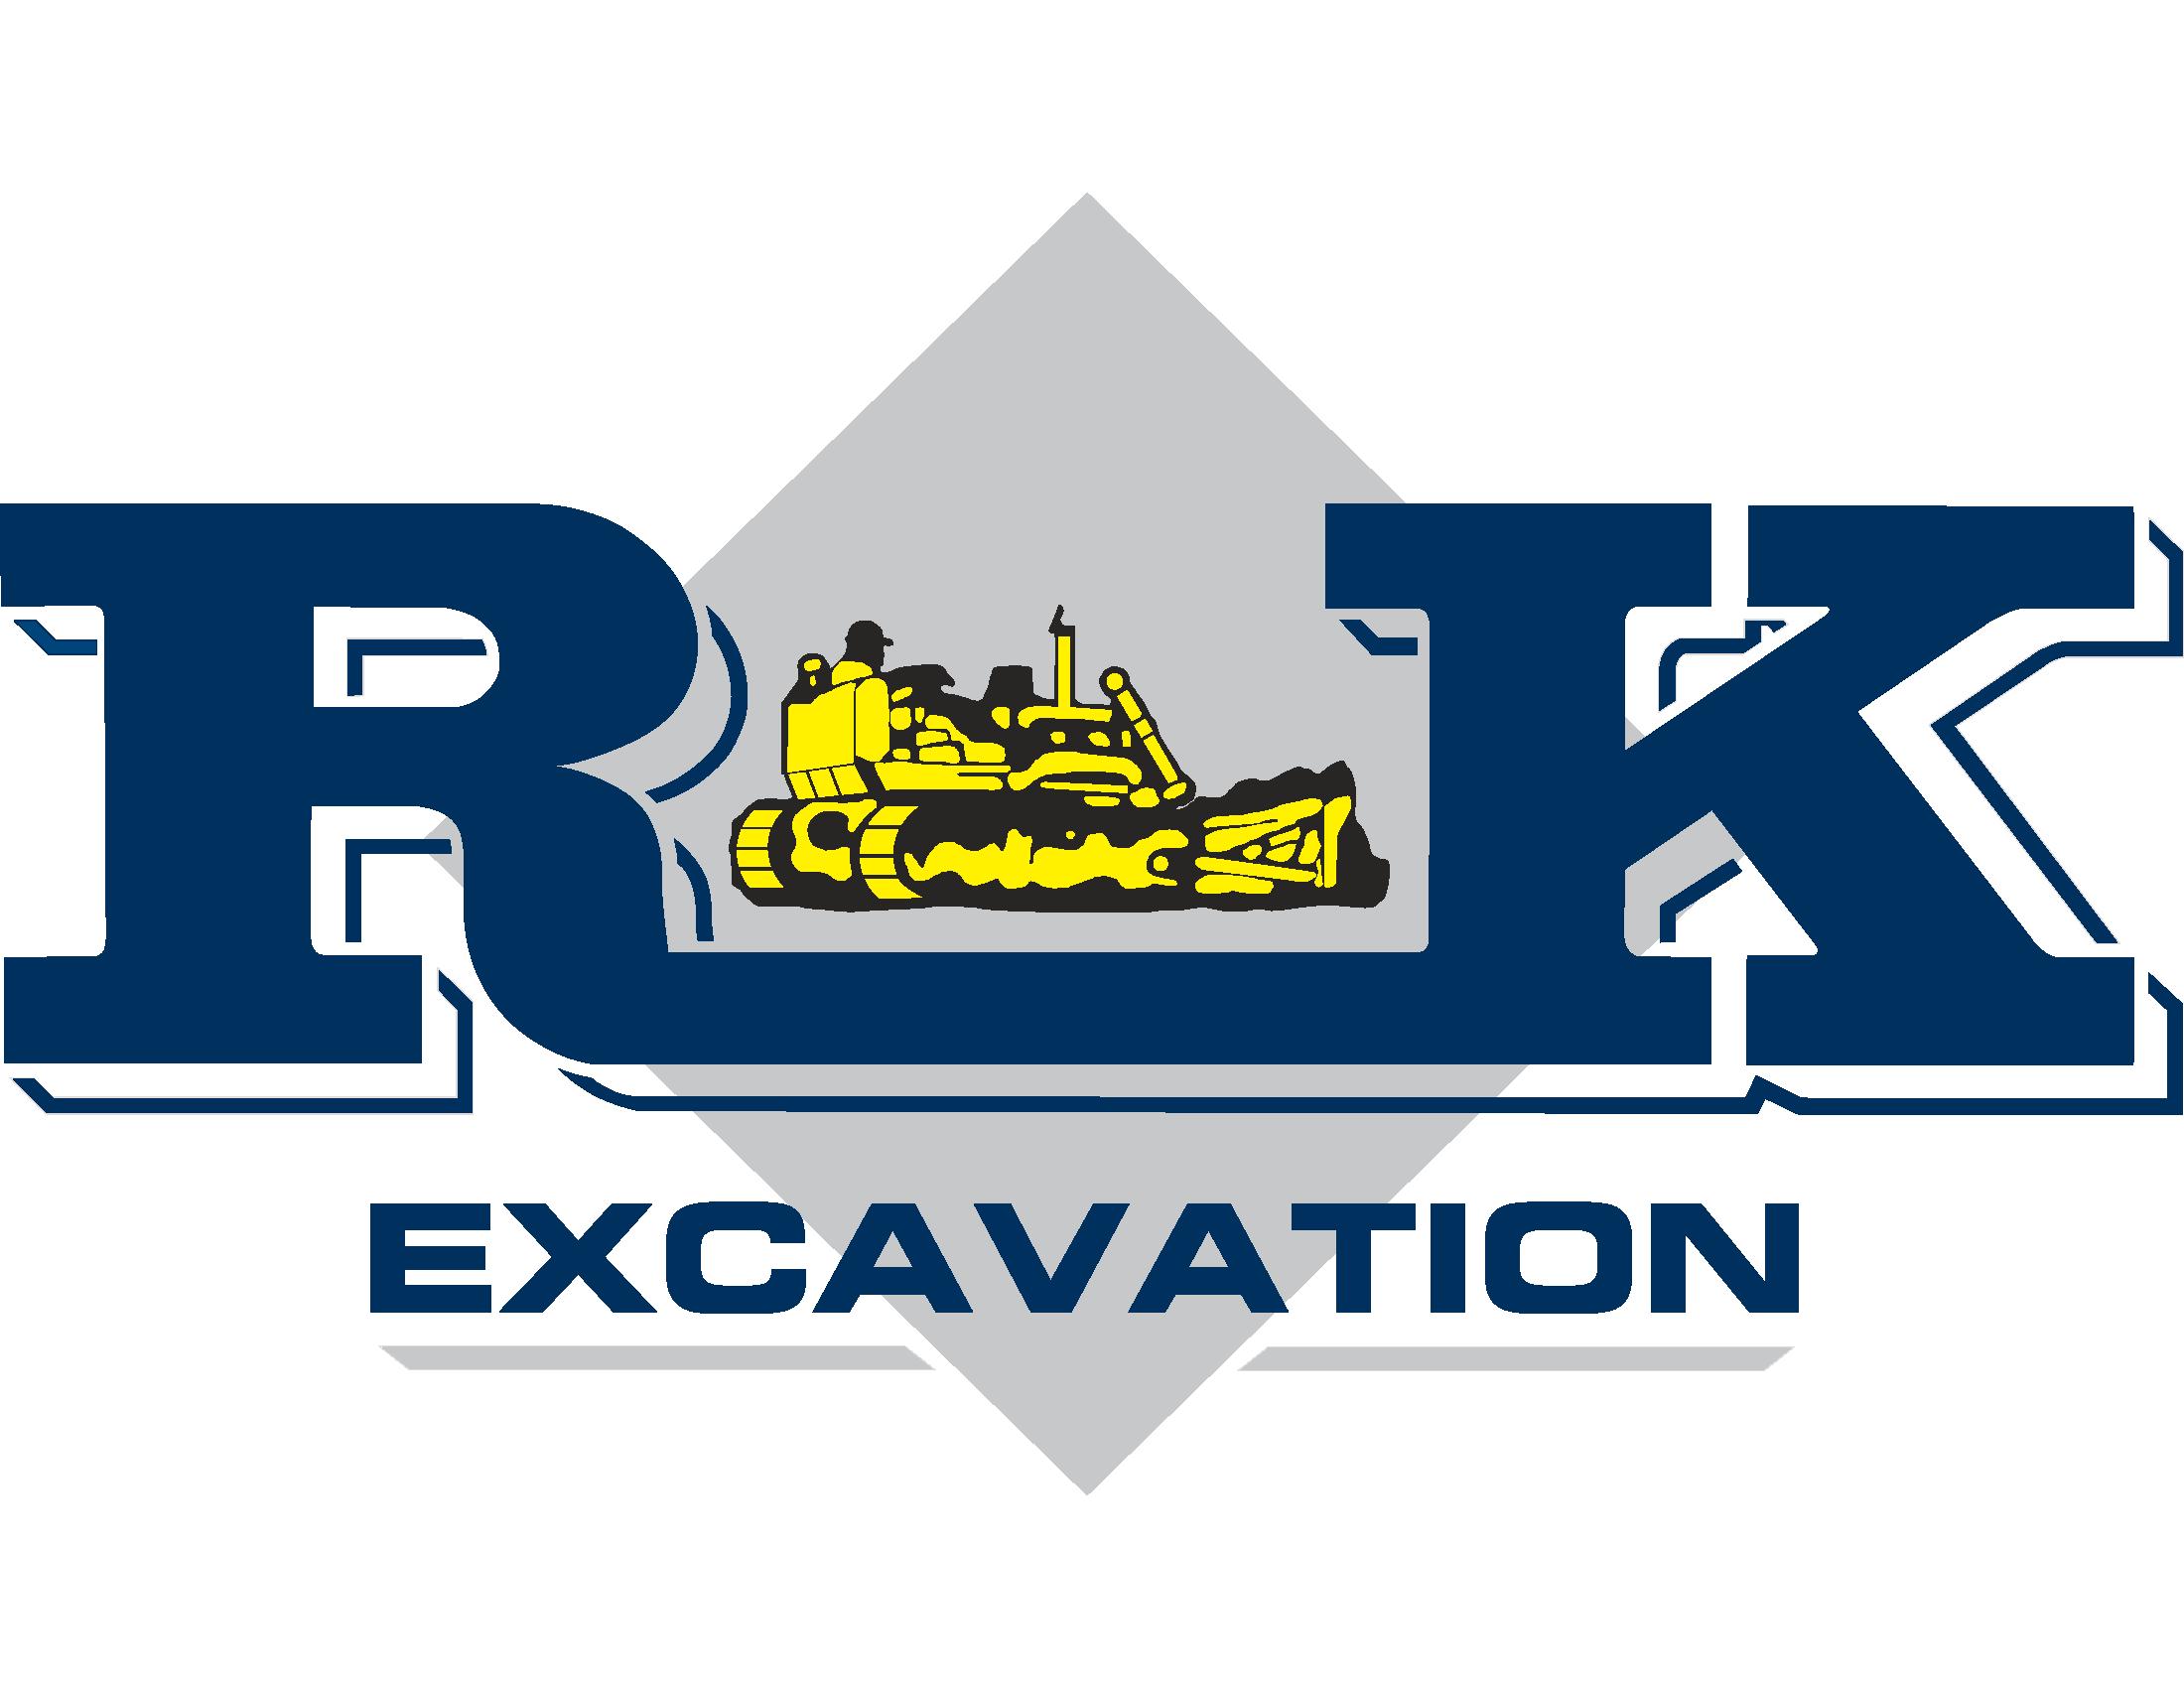 R&K Excavation